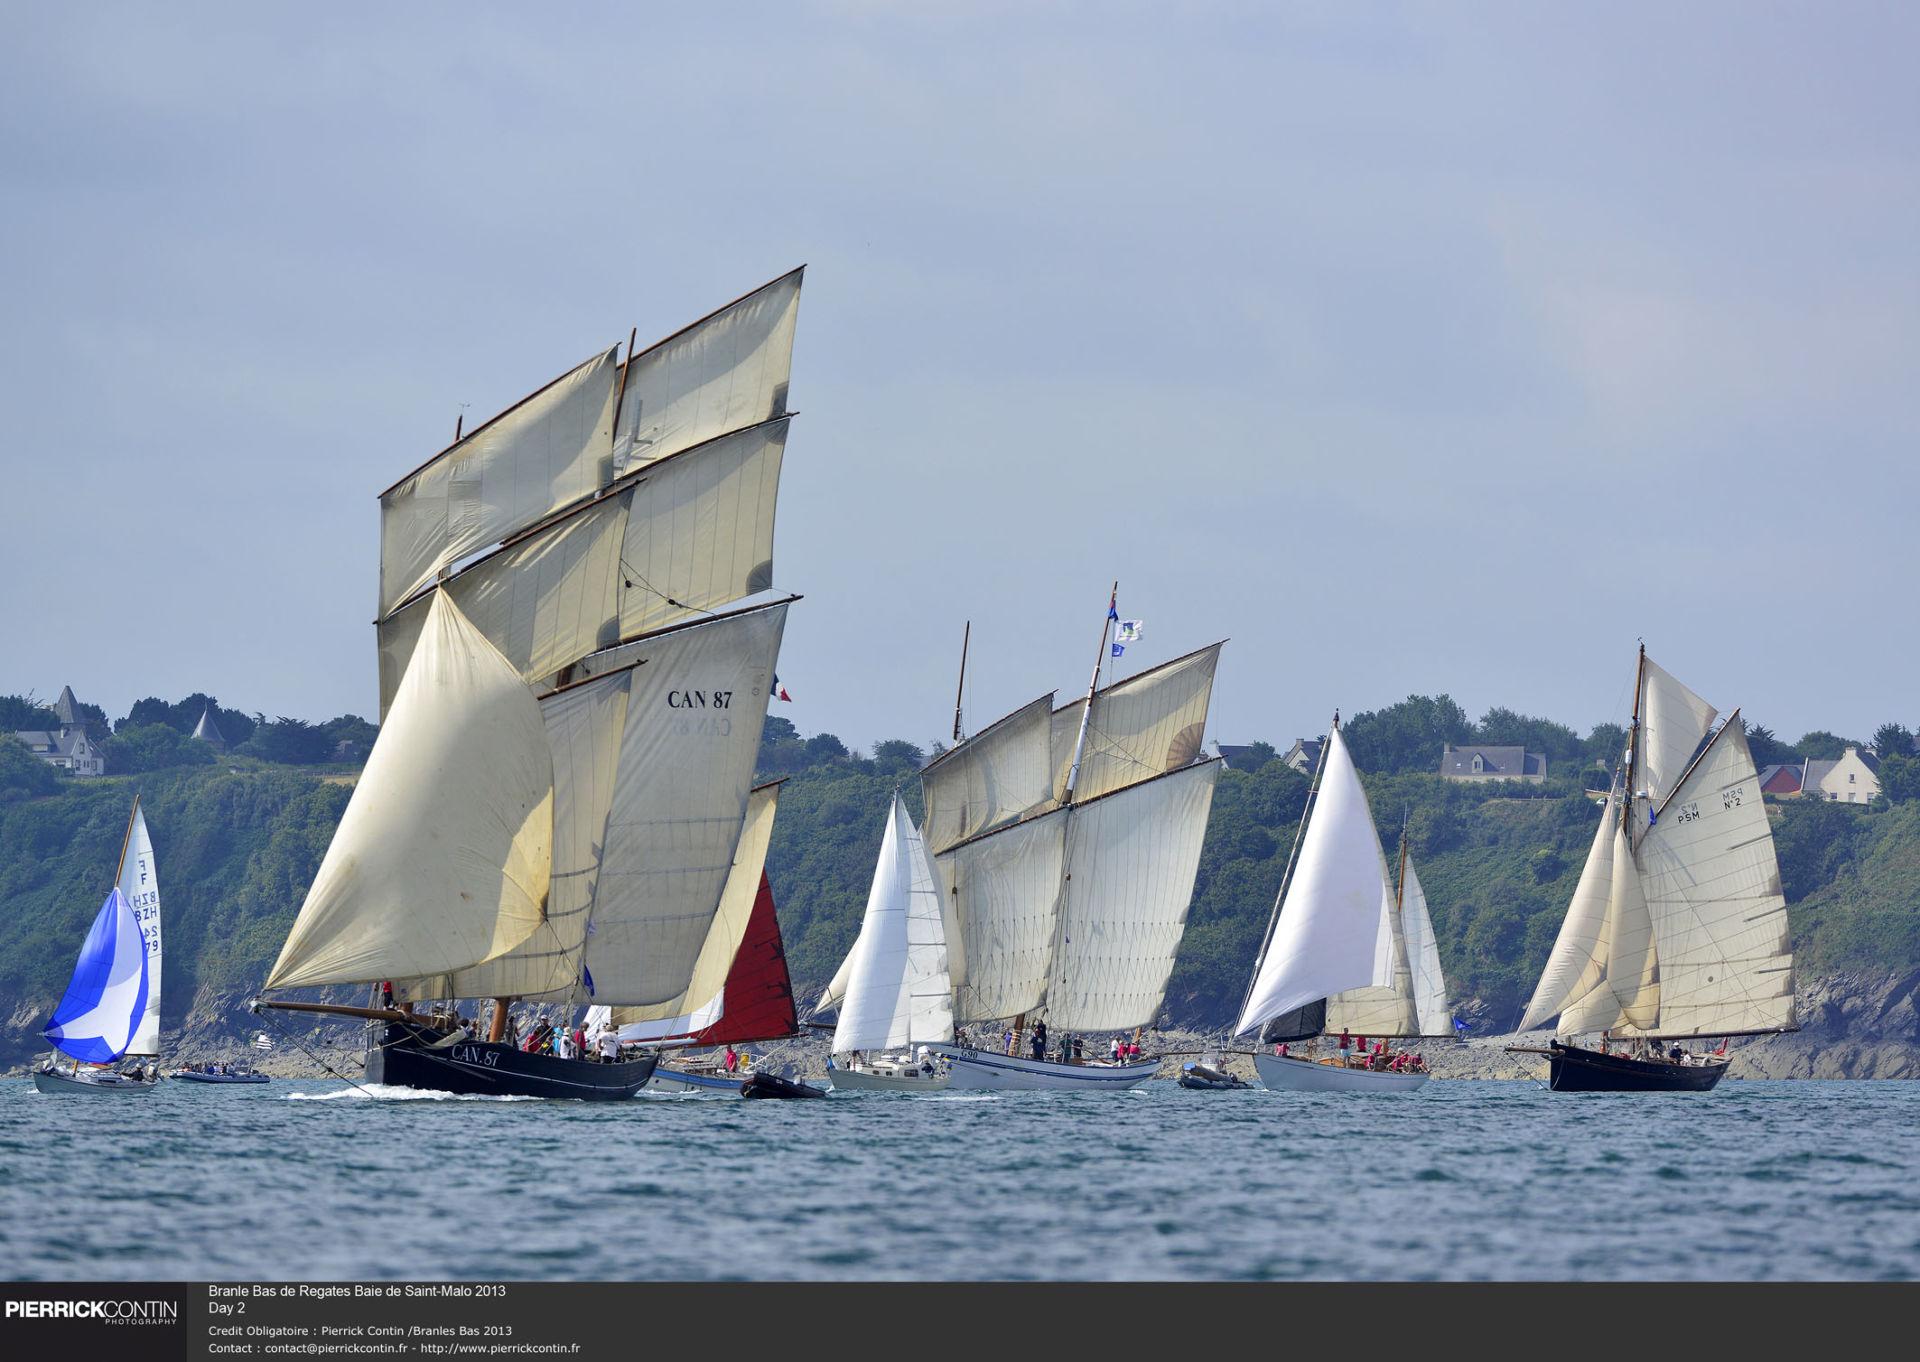 Branle Bas de Regates Baie de Saint-Malo 2013